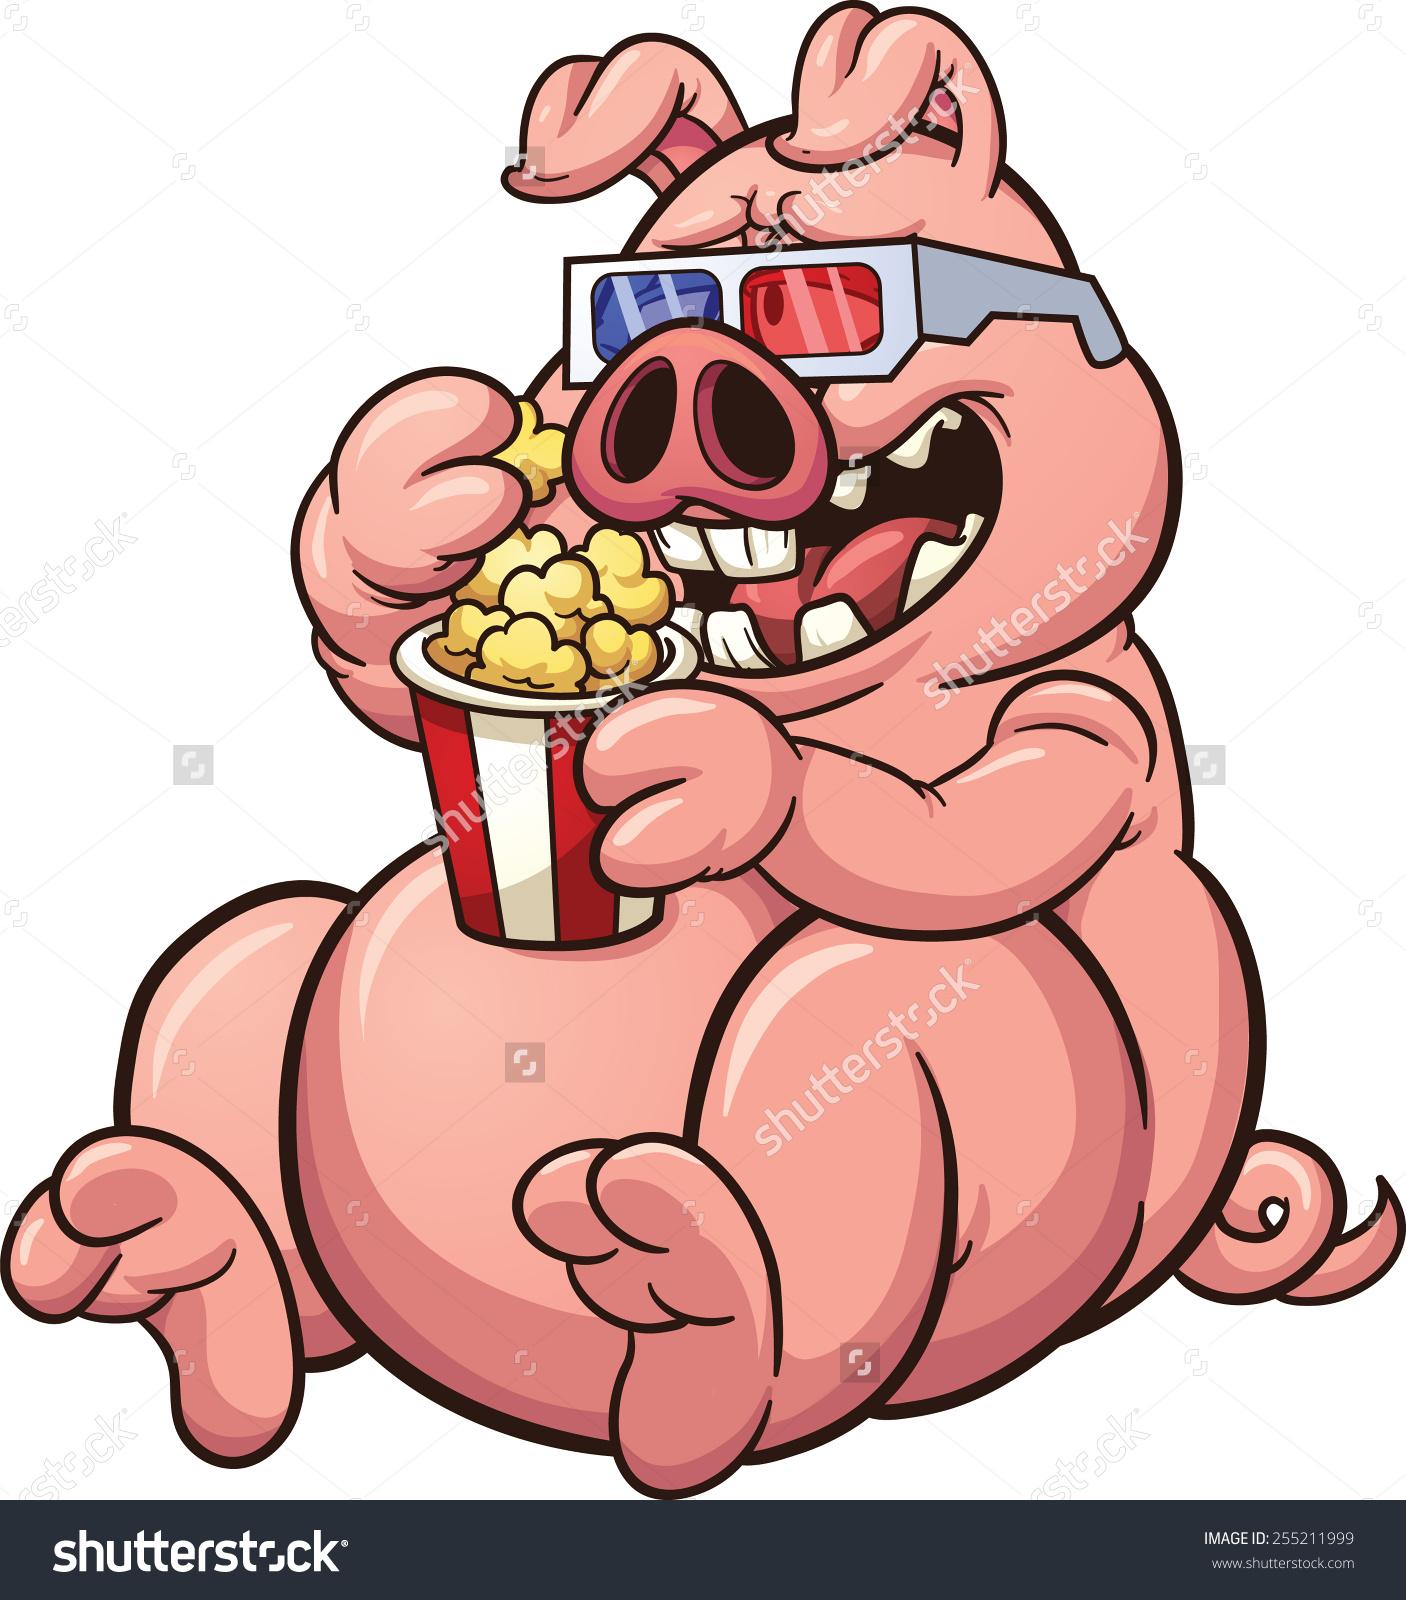 Fat Cartoon Pig Eating Popcorn Wearing Stock Vector 255211999.